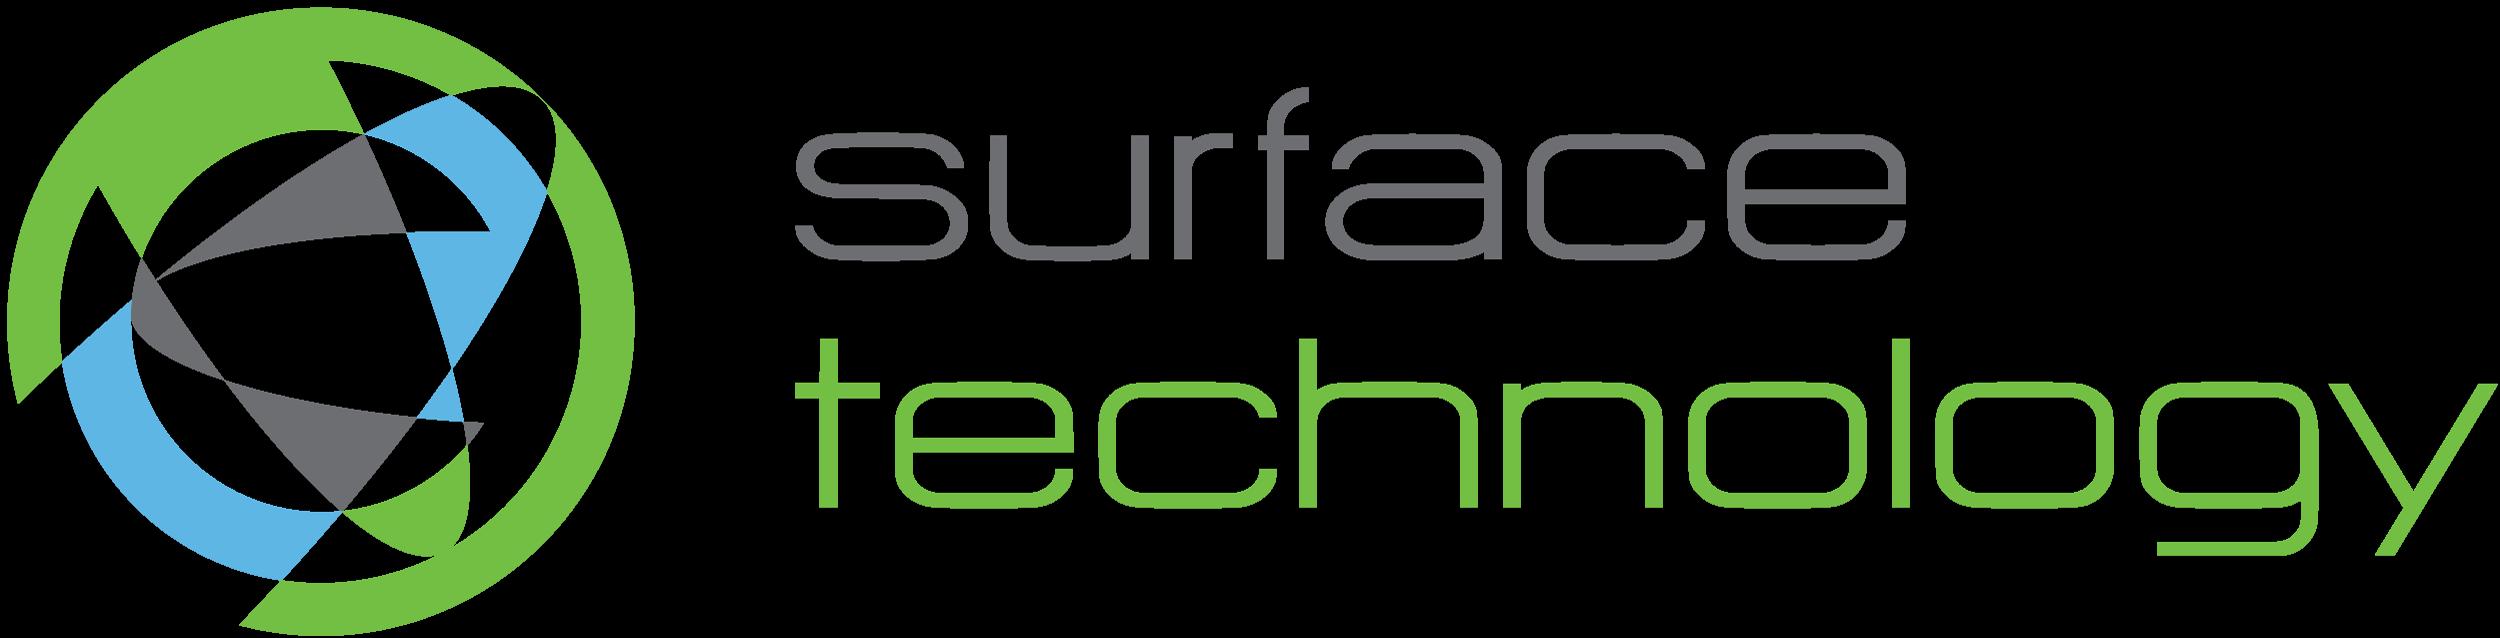 Surface Technology Logo Design